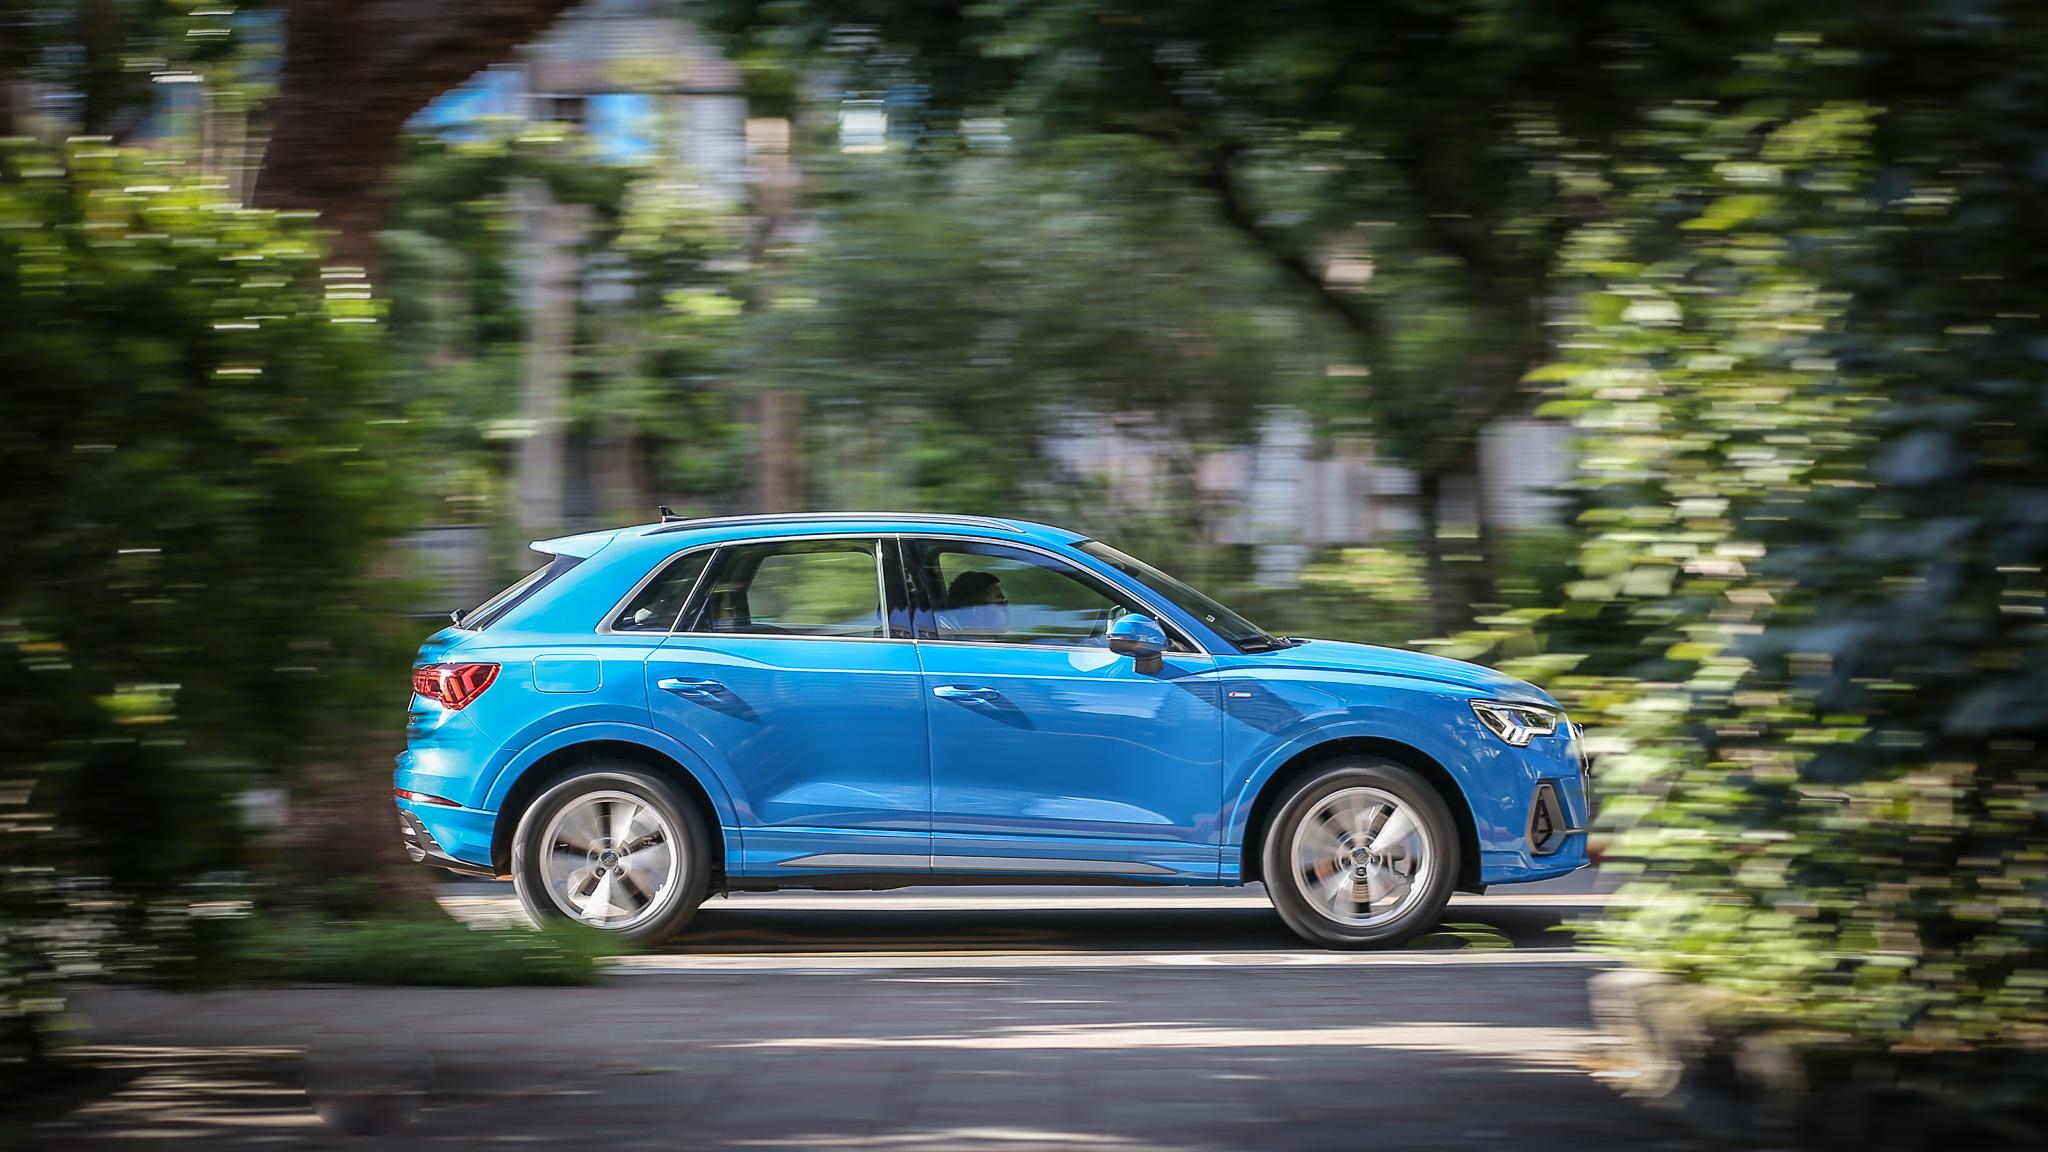 Audi Q3 有能力技壓對手嗎?就由 Q3 40 TFSI quattro S line 來下結論吧!